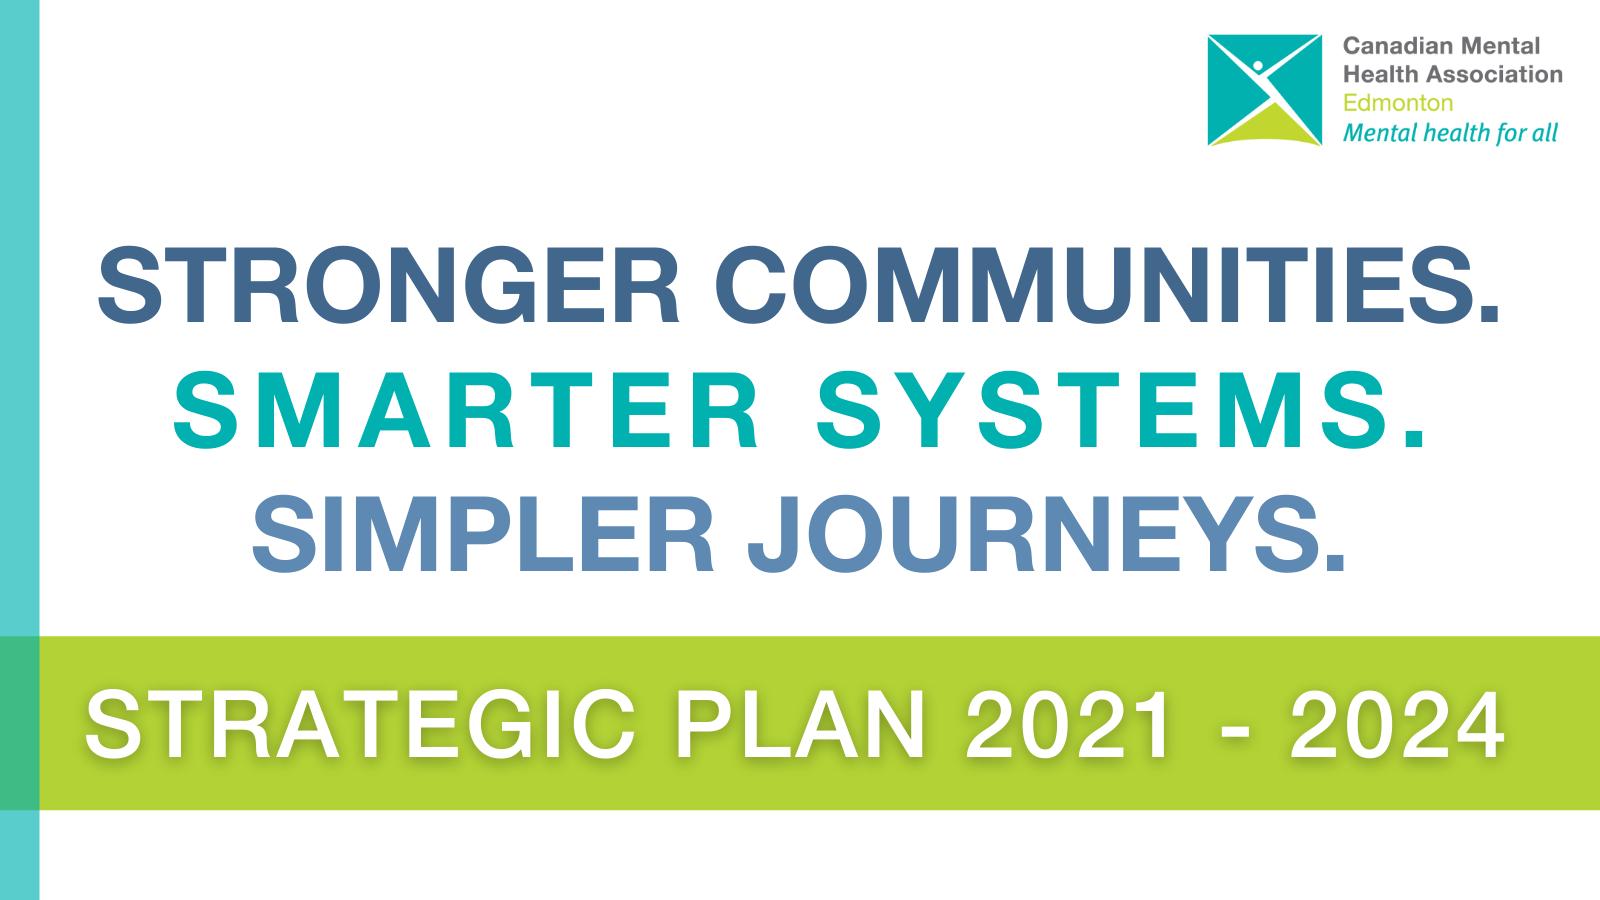 Text reads 'Stronger communities. Smarter systems. Simpler journeys. Strategic Plan 2021 - 2024'